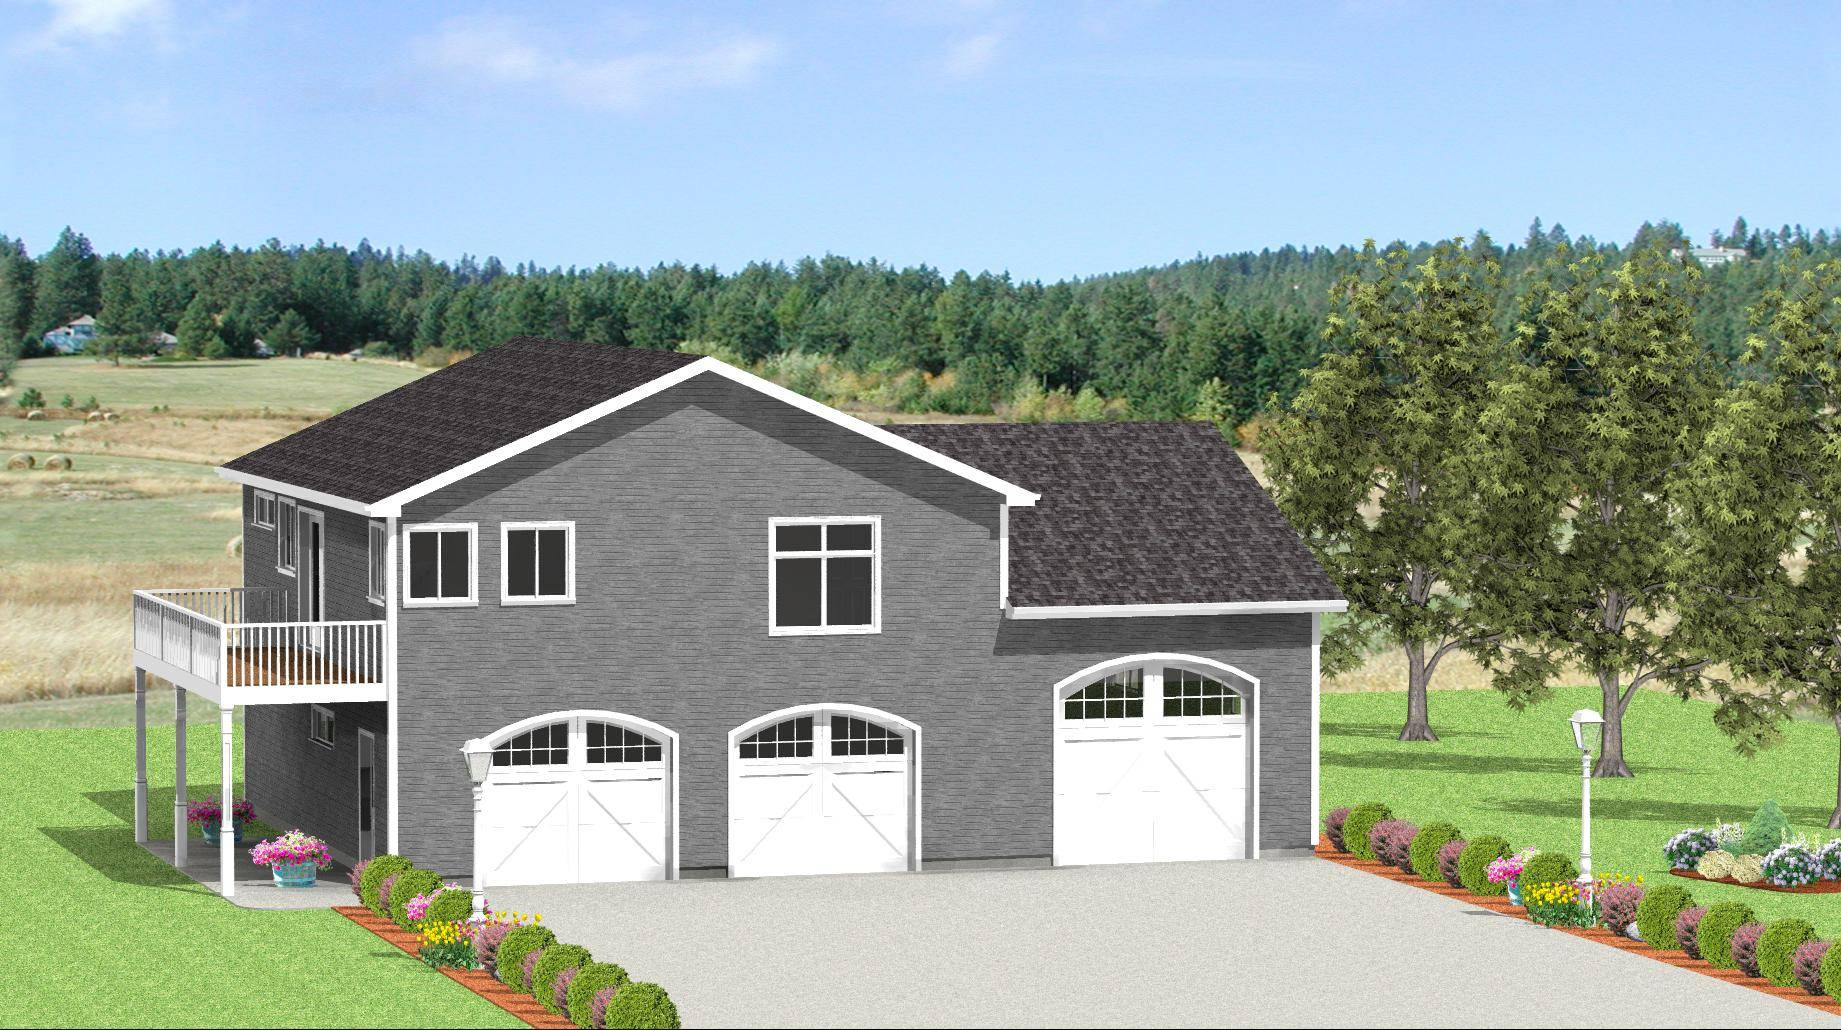 Garage Plans Design Connection Llc House